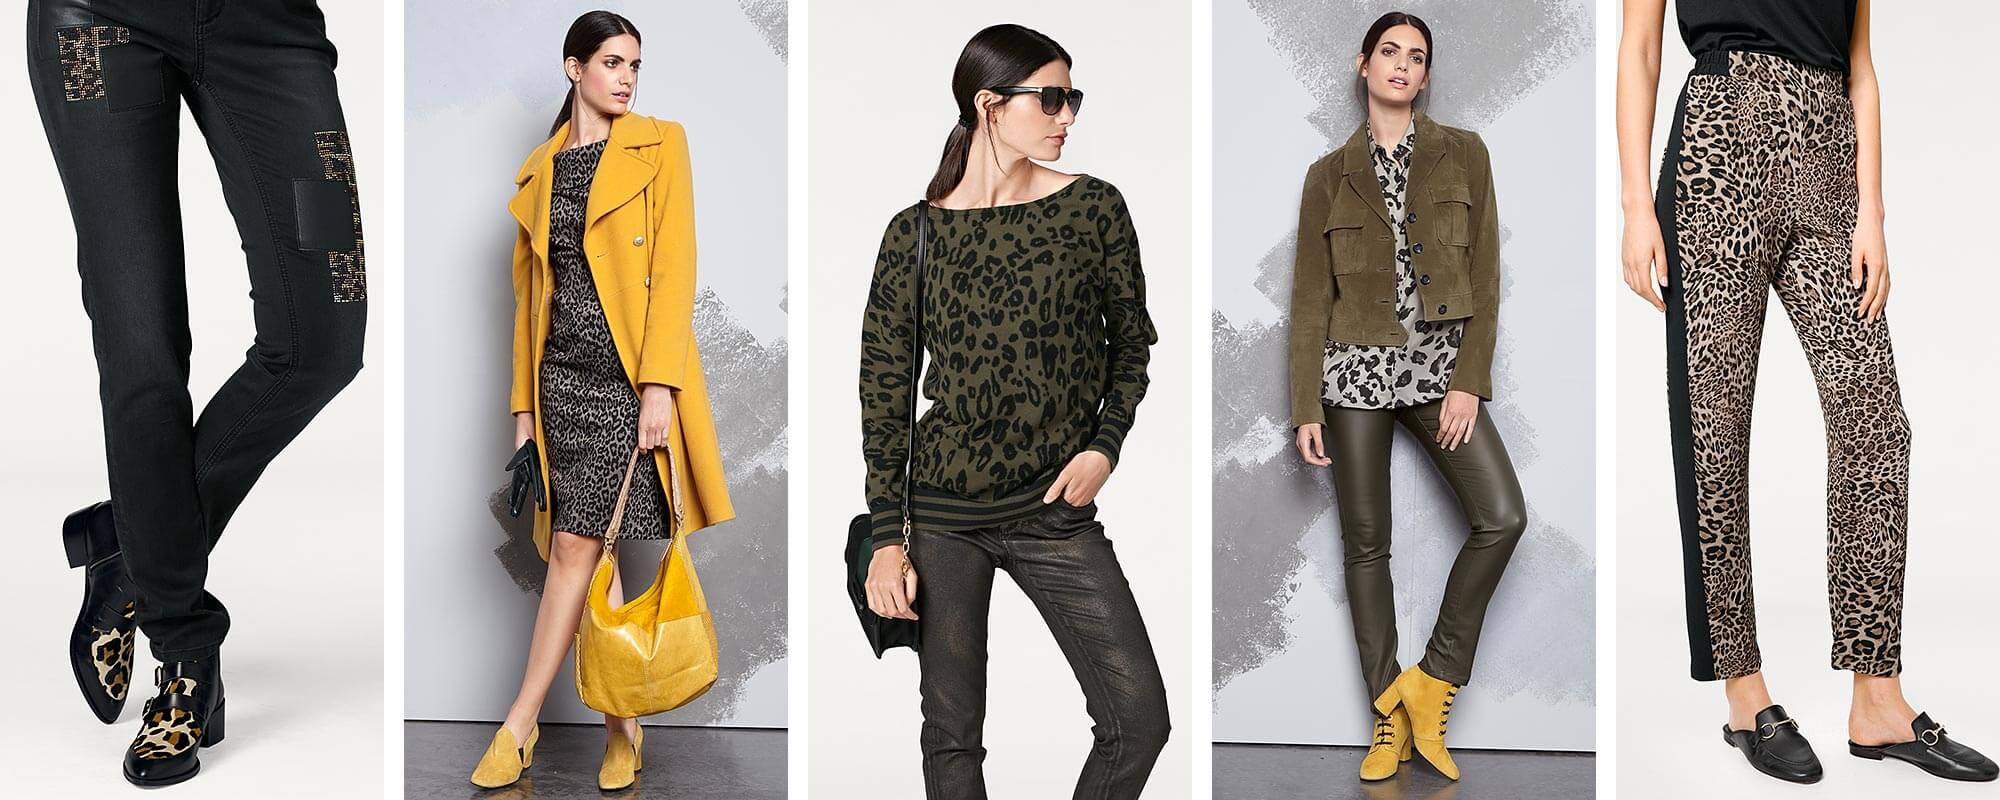 Trend_Animal_outfit_oktober_kollage_1